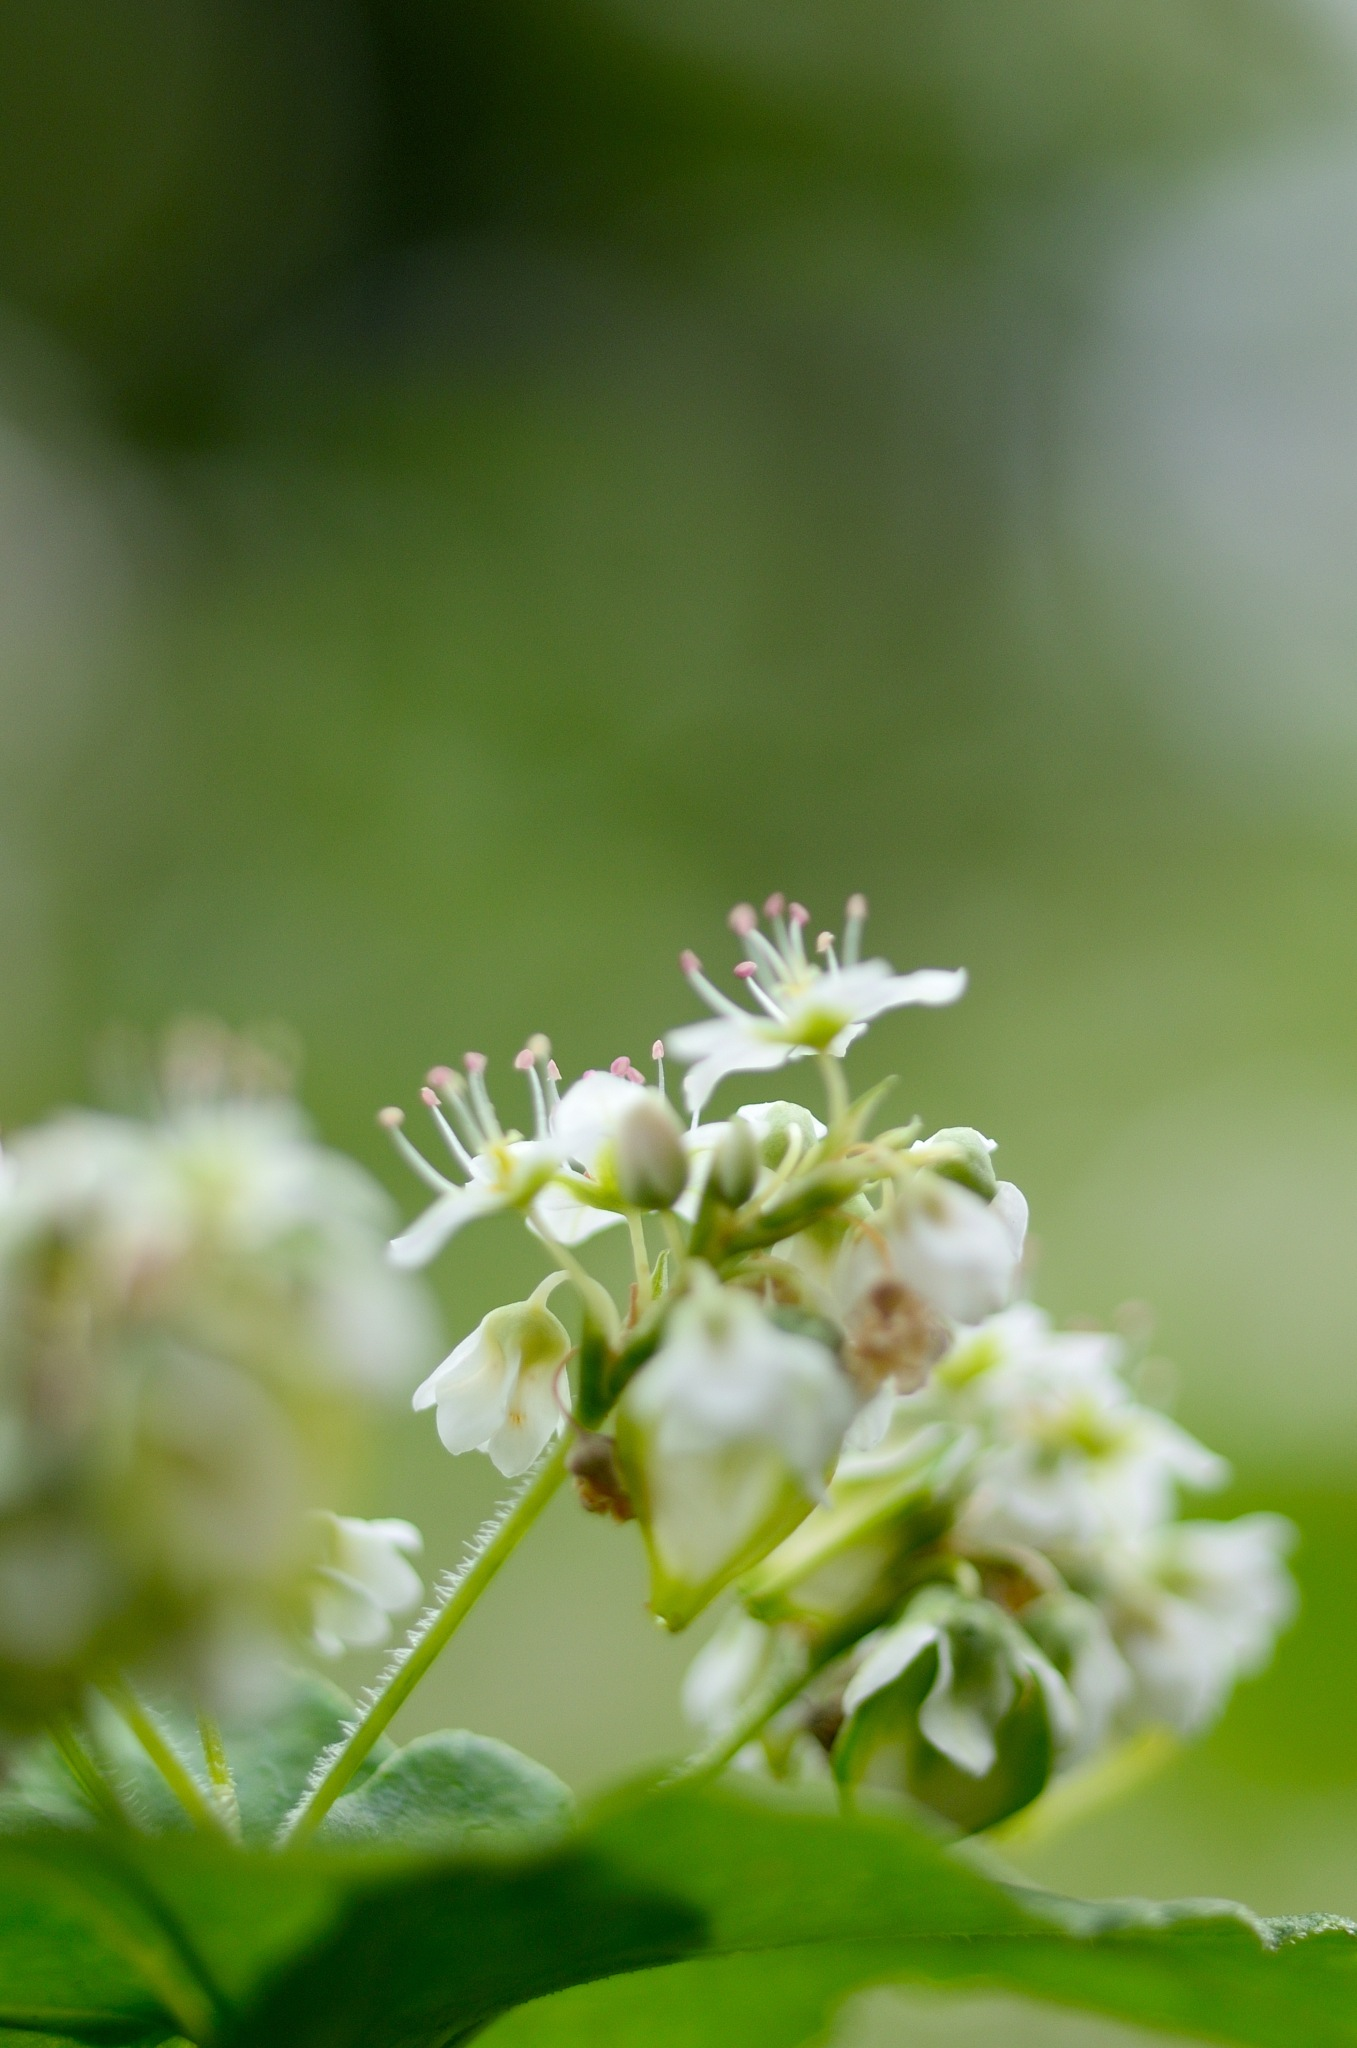 Buckwheat take2 by Masahiro  Asano